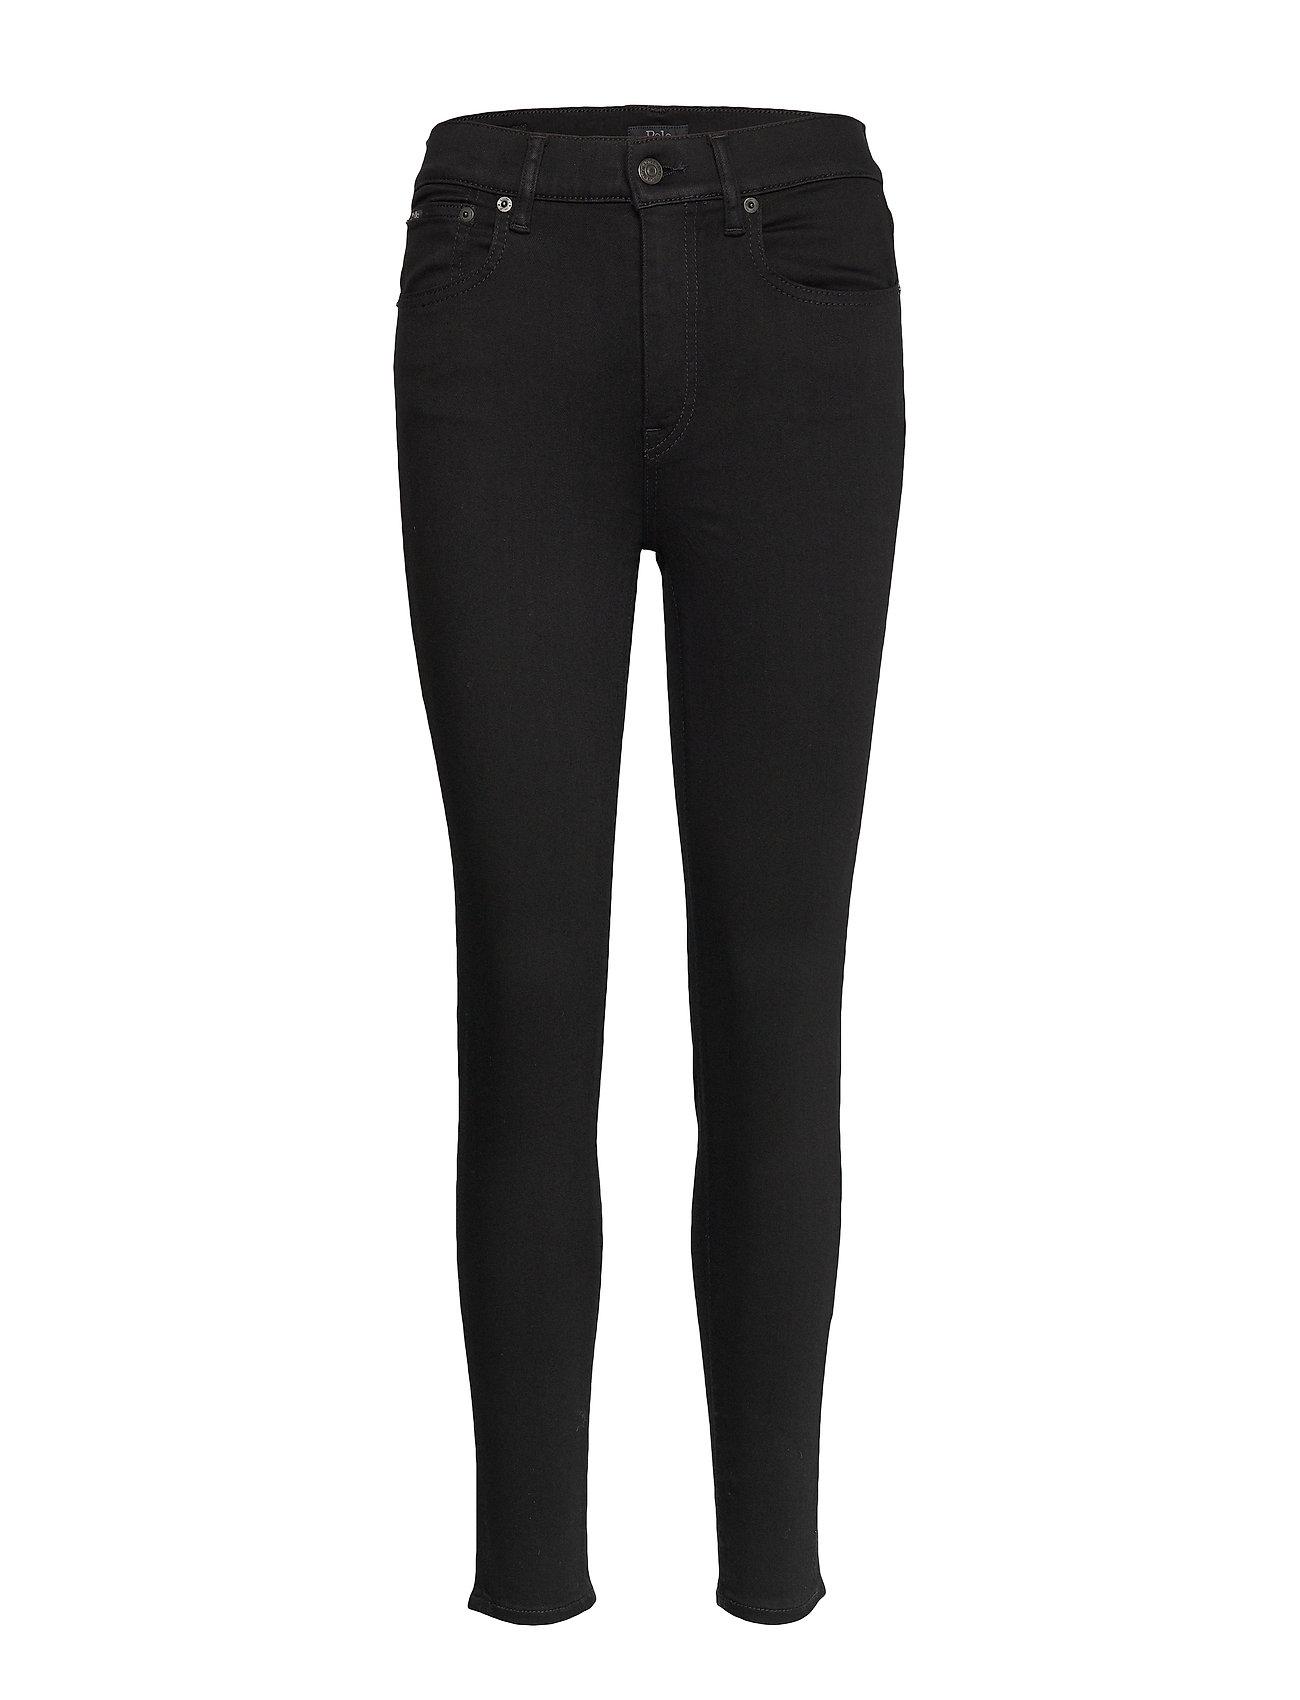 Polo Ralph Lauren Tompkins Skinny High-Rise Jean - BLACK